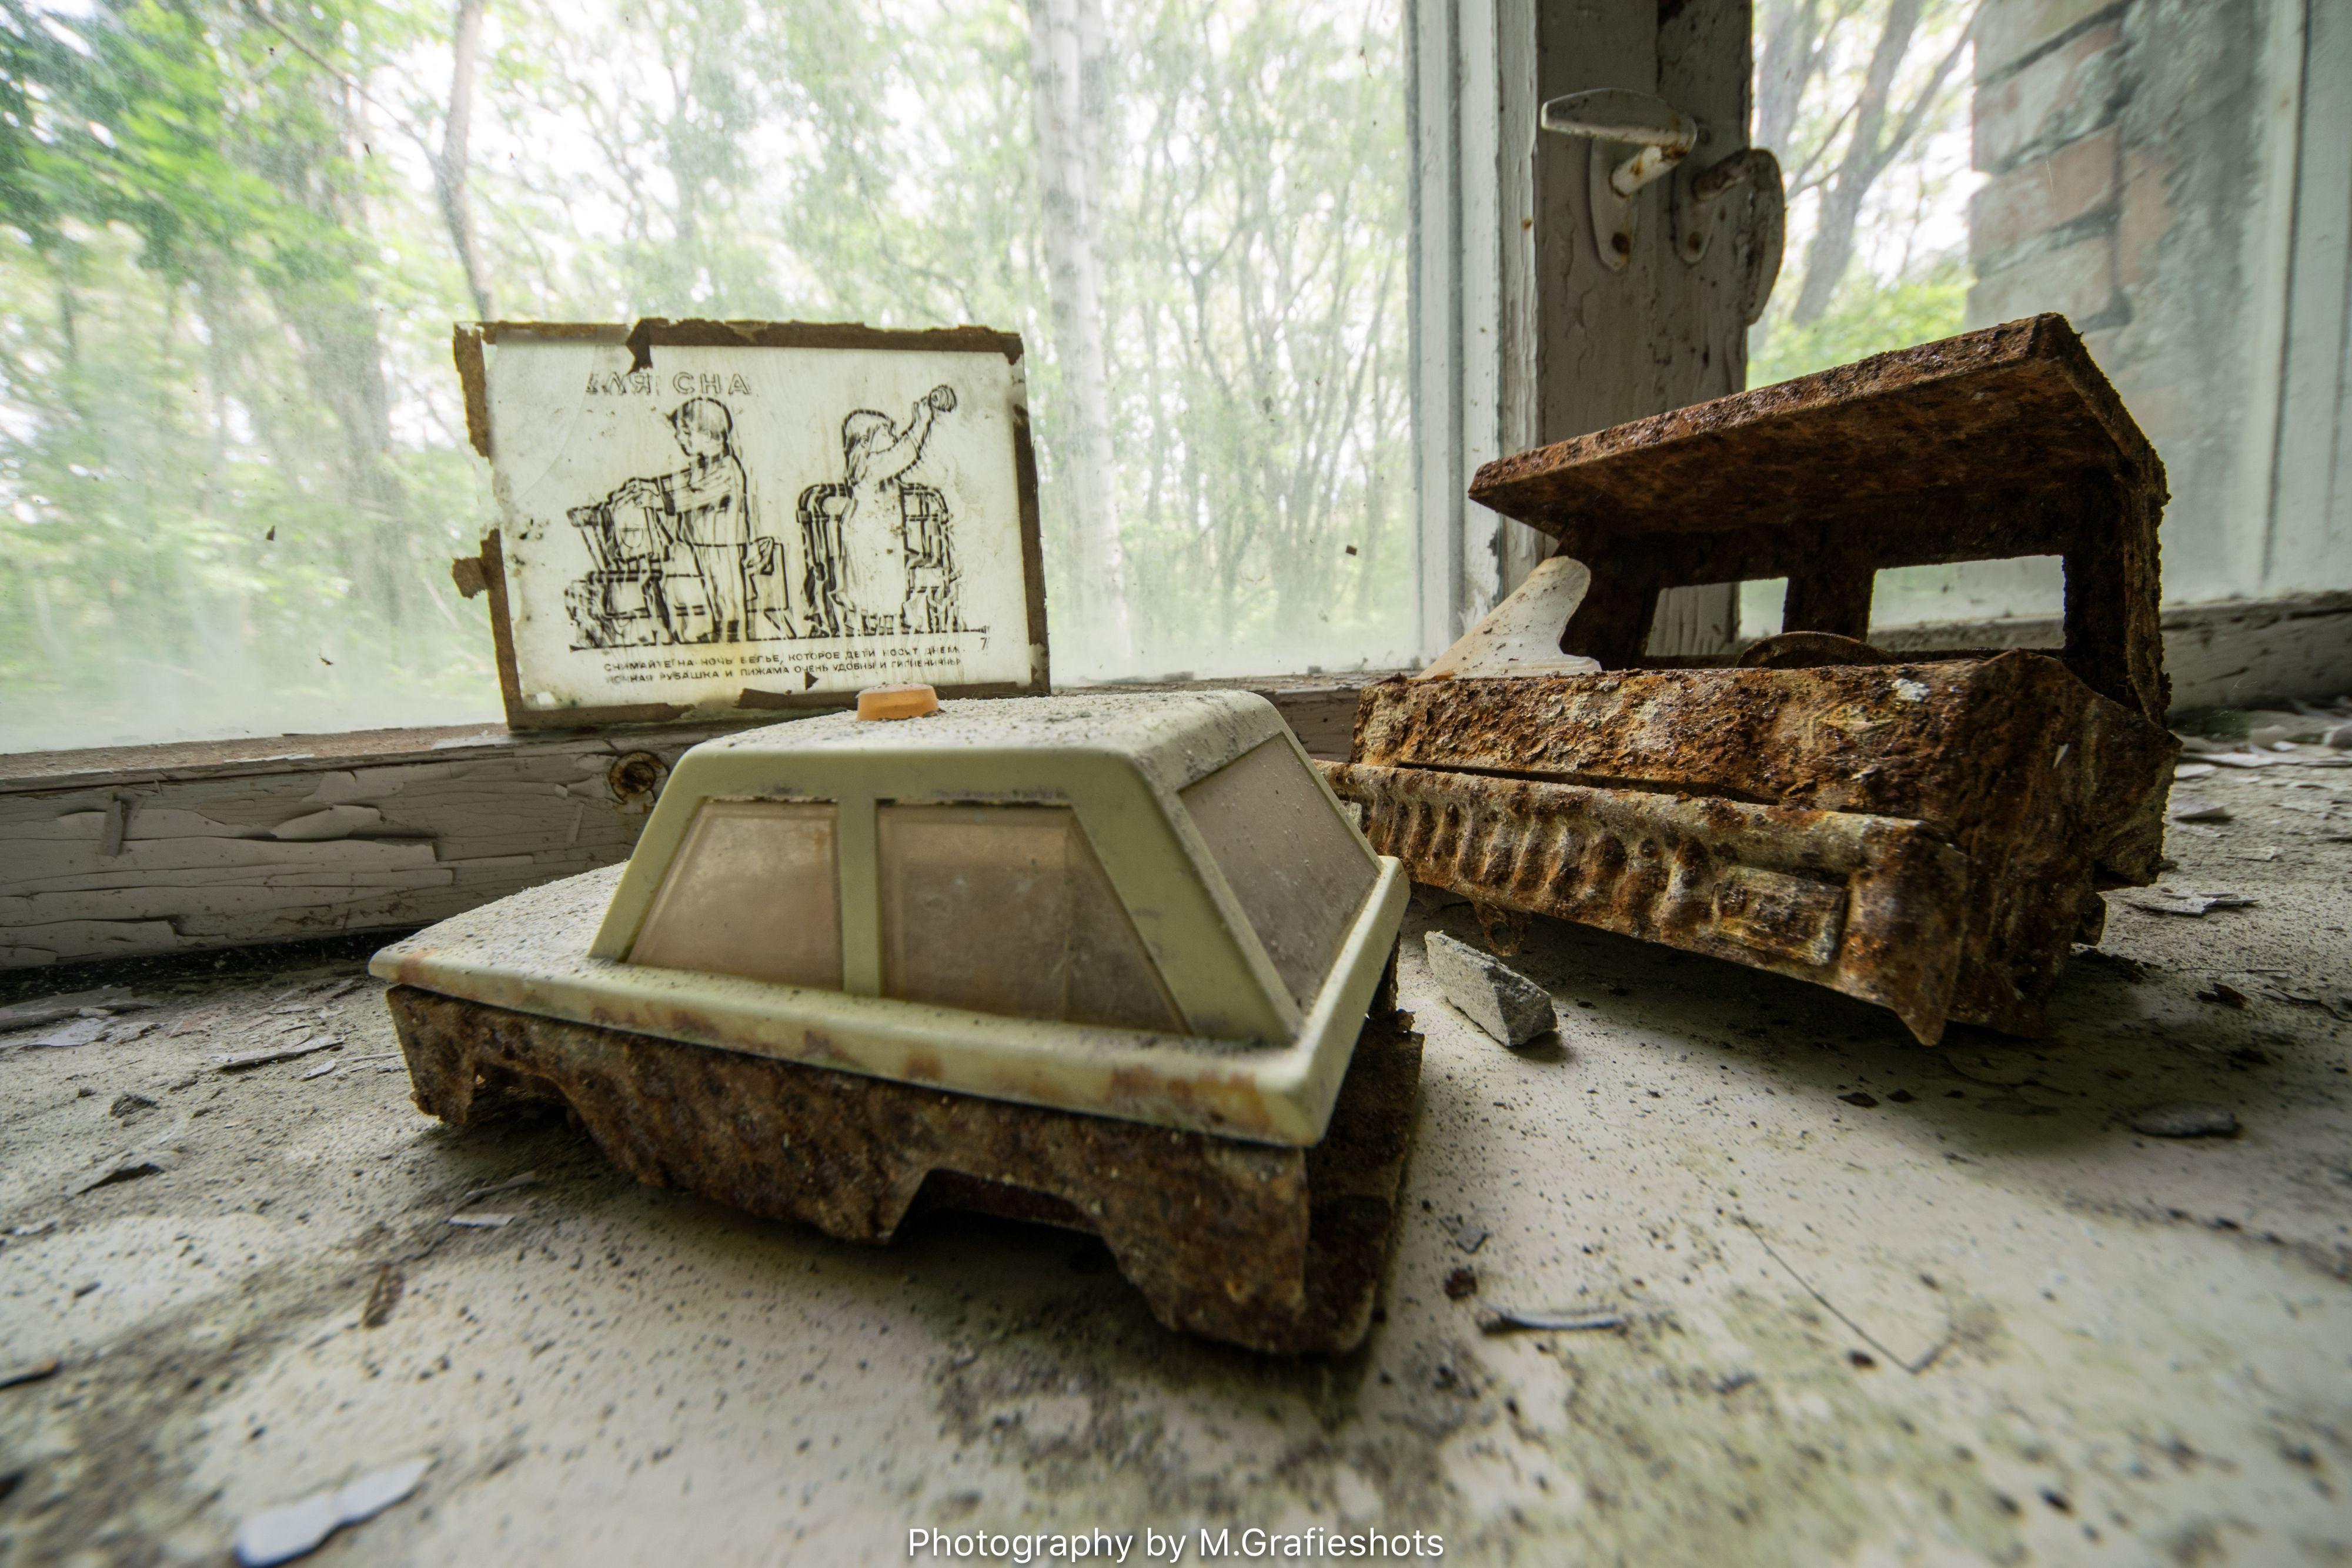 23-jarige Nederlander verkent omgeving Tsjernobyl